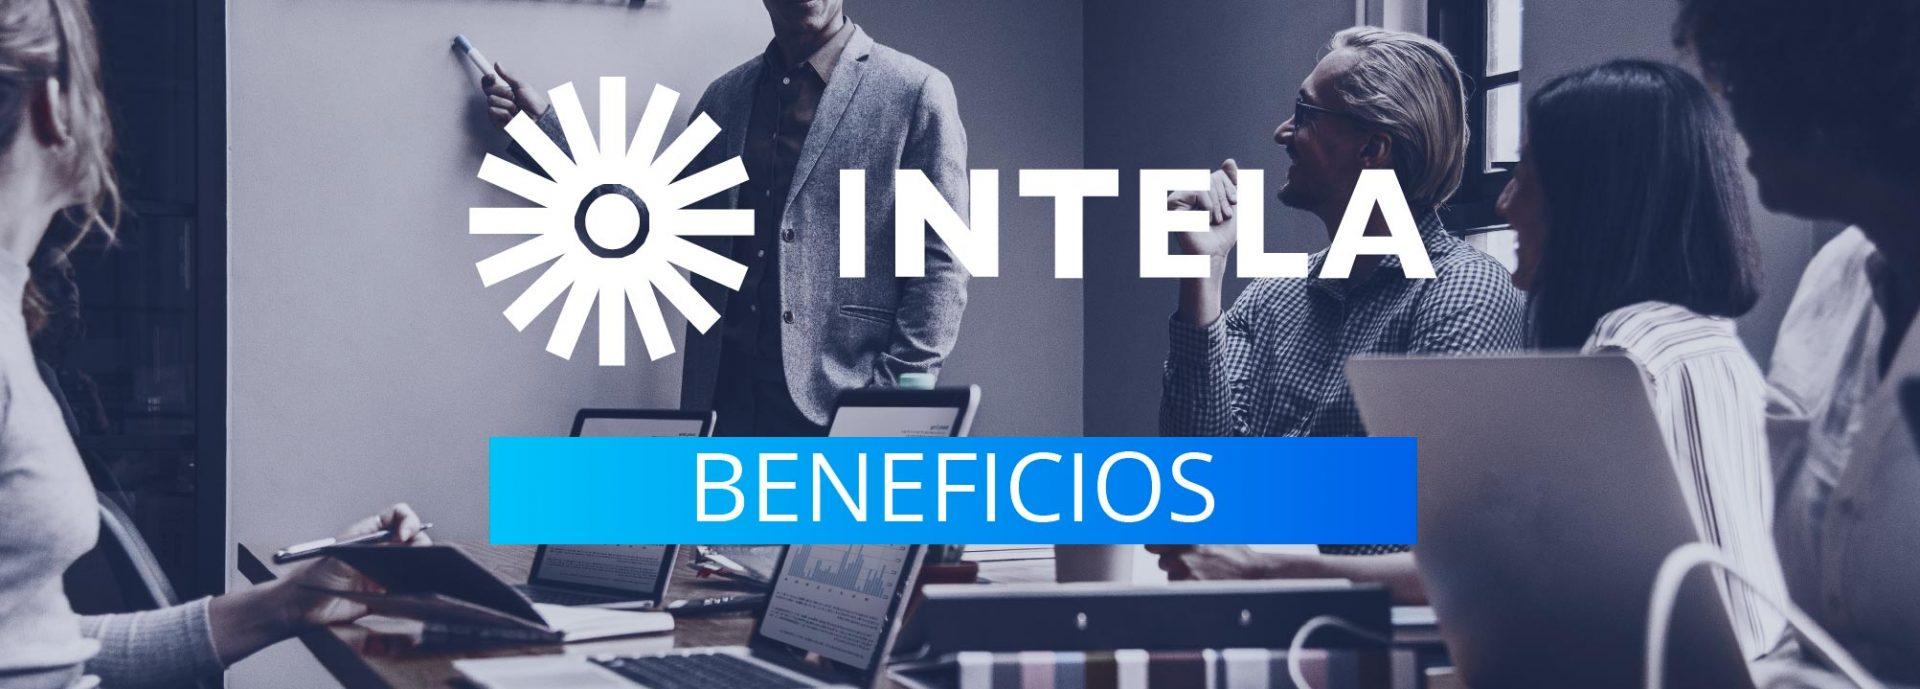 Tarjeta de Beneficios Intela